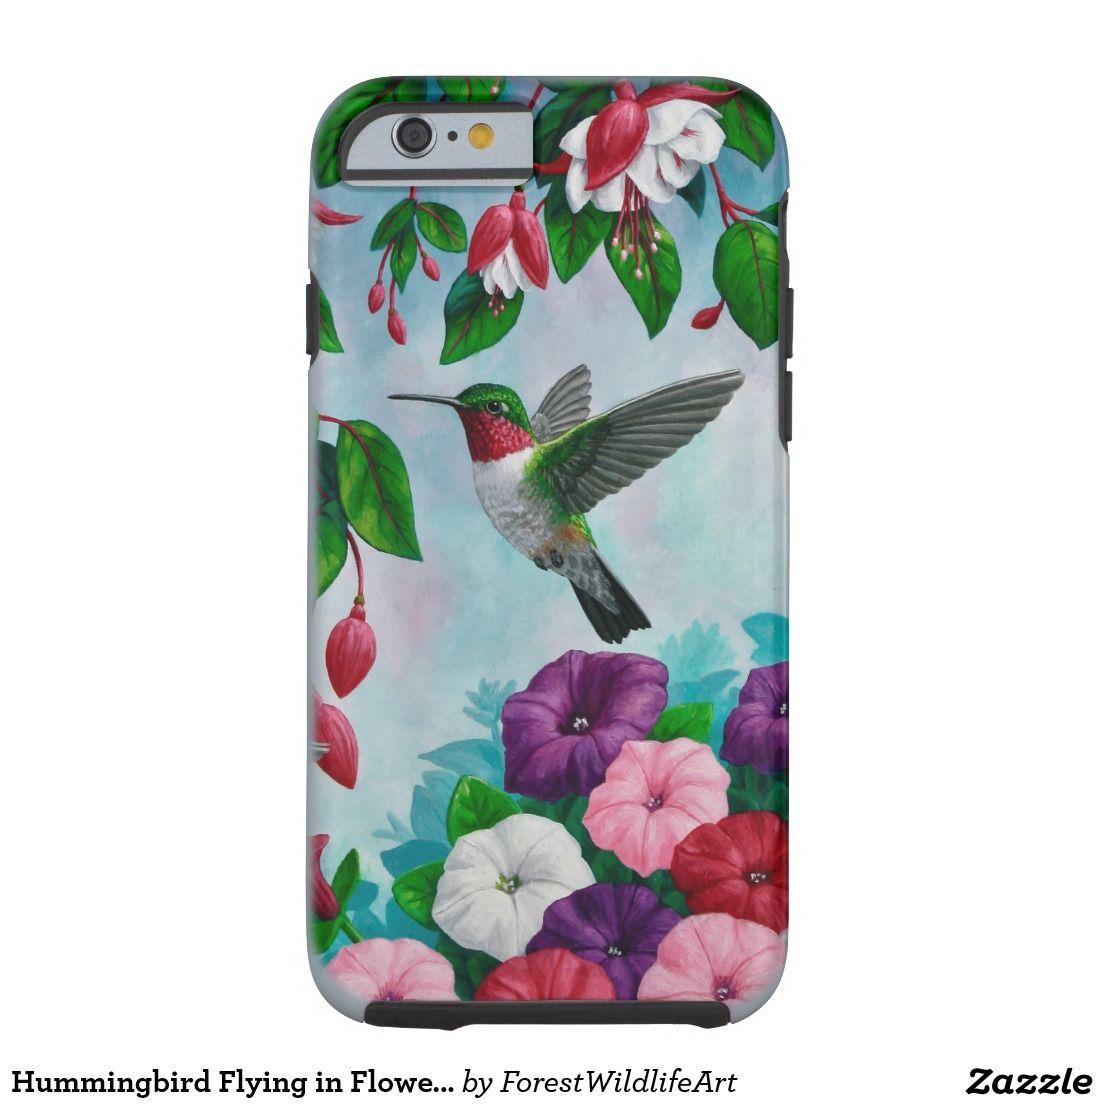 Hummingbird Flying in Flower Garden Tough iPhone 6 Case